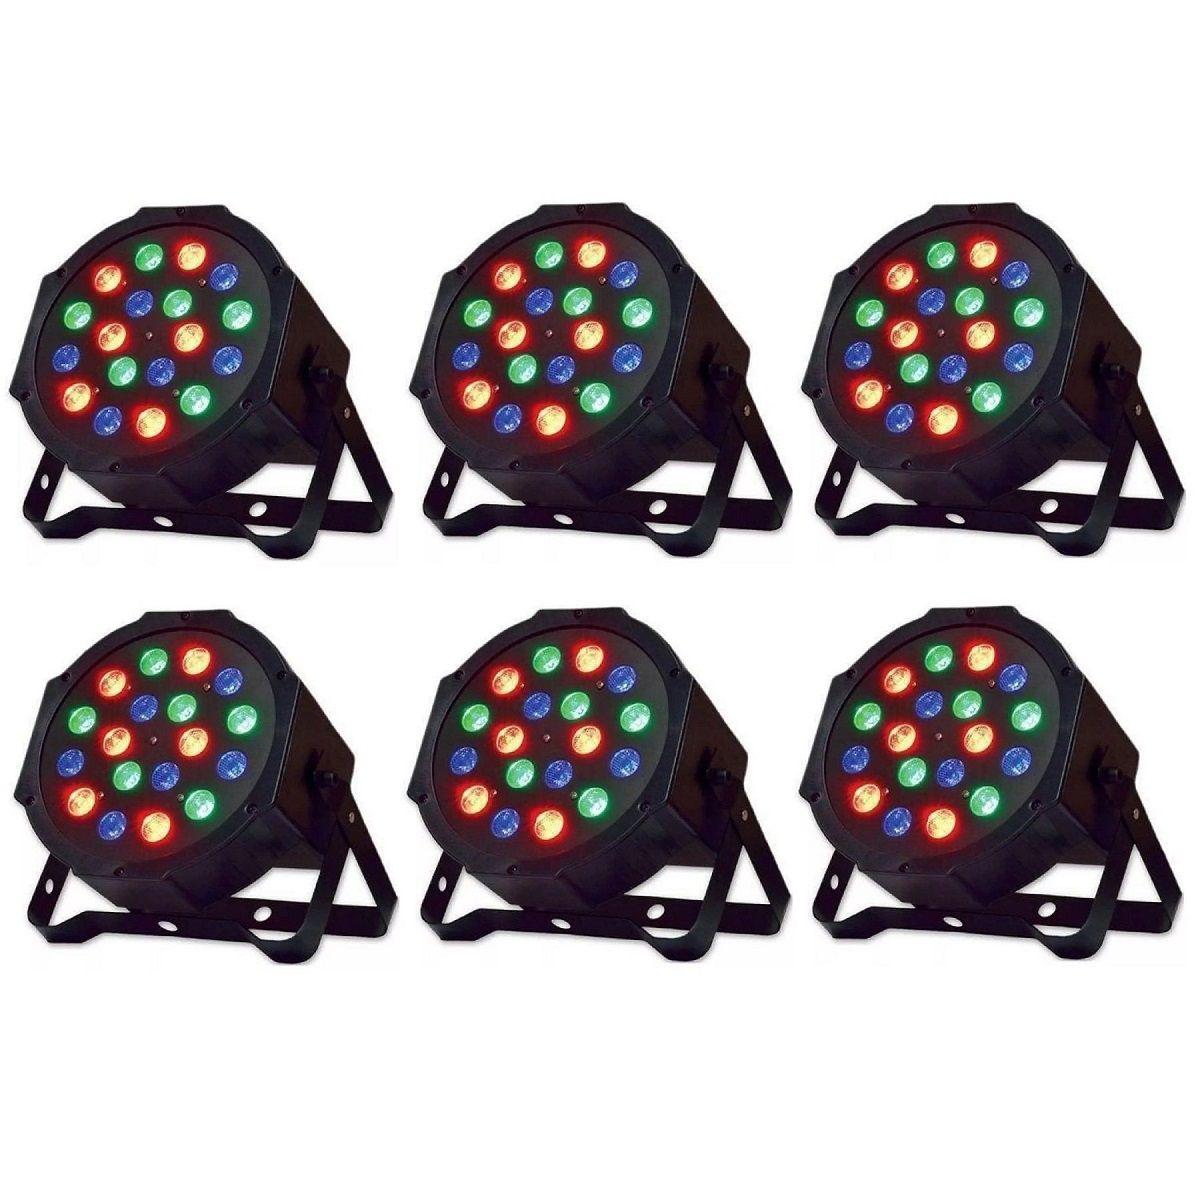 Kit 6x Canhão de Luz PAR 18 LEDs 1W RGB DMX Strobo Painel Digital